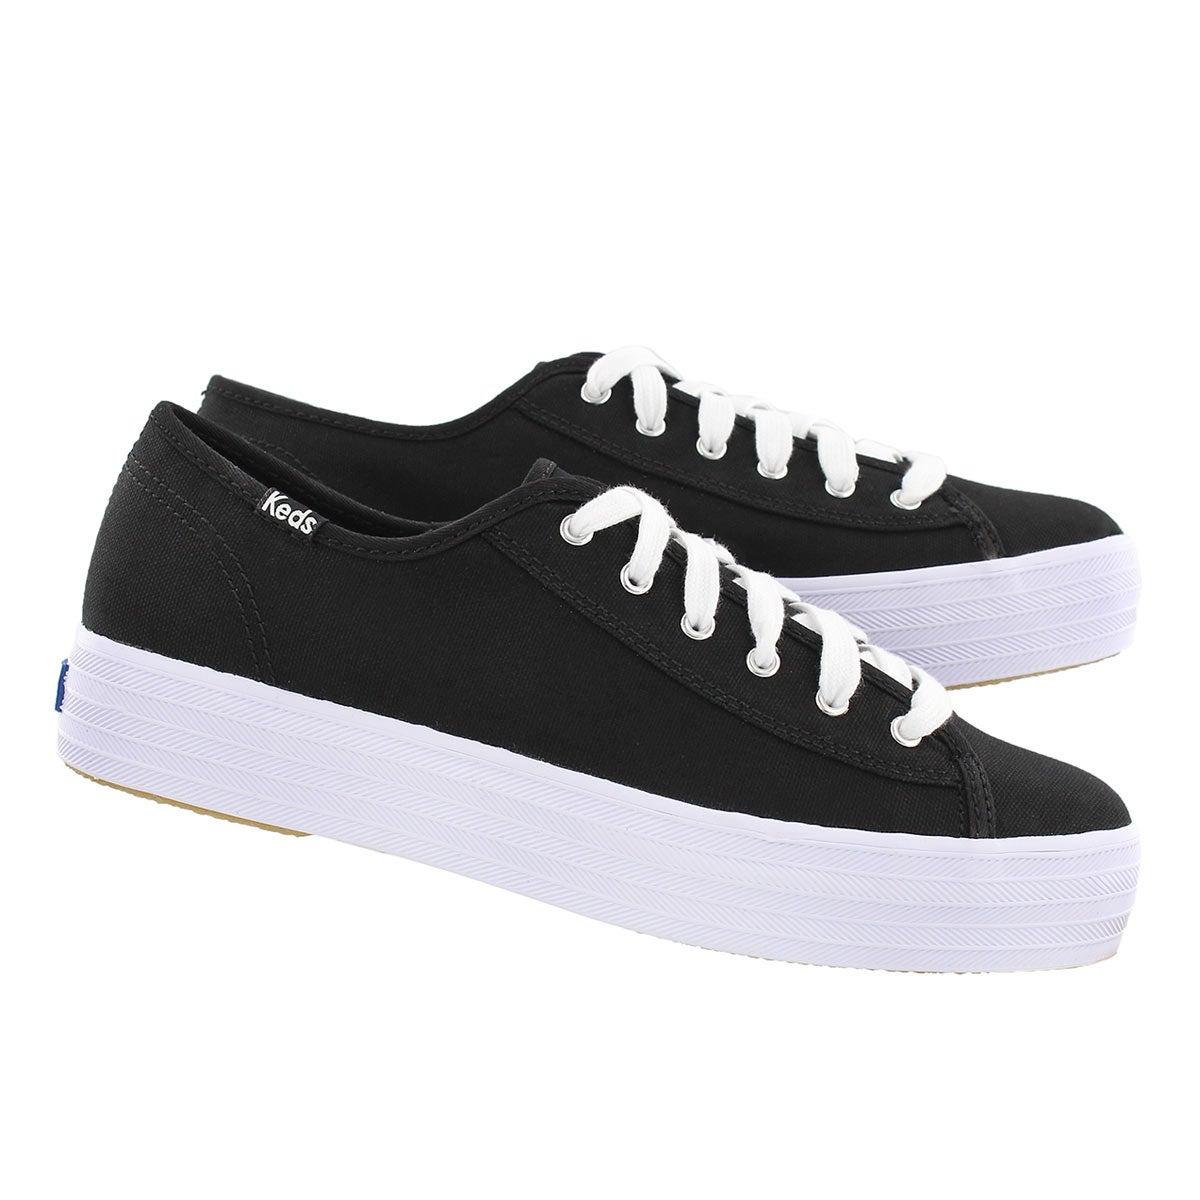 Lds Triple Kick blk/wht sneaker